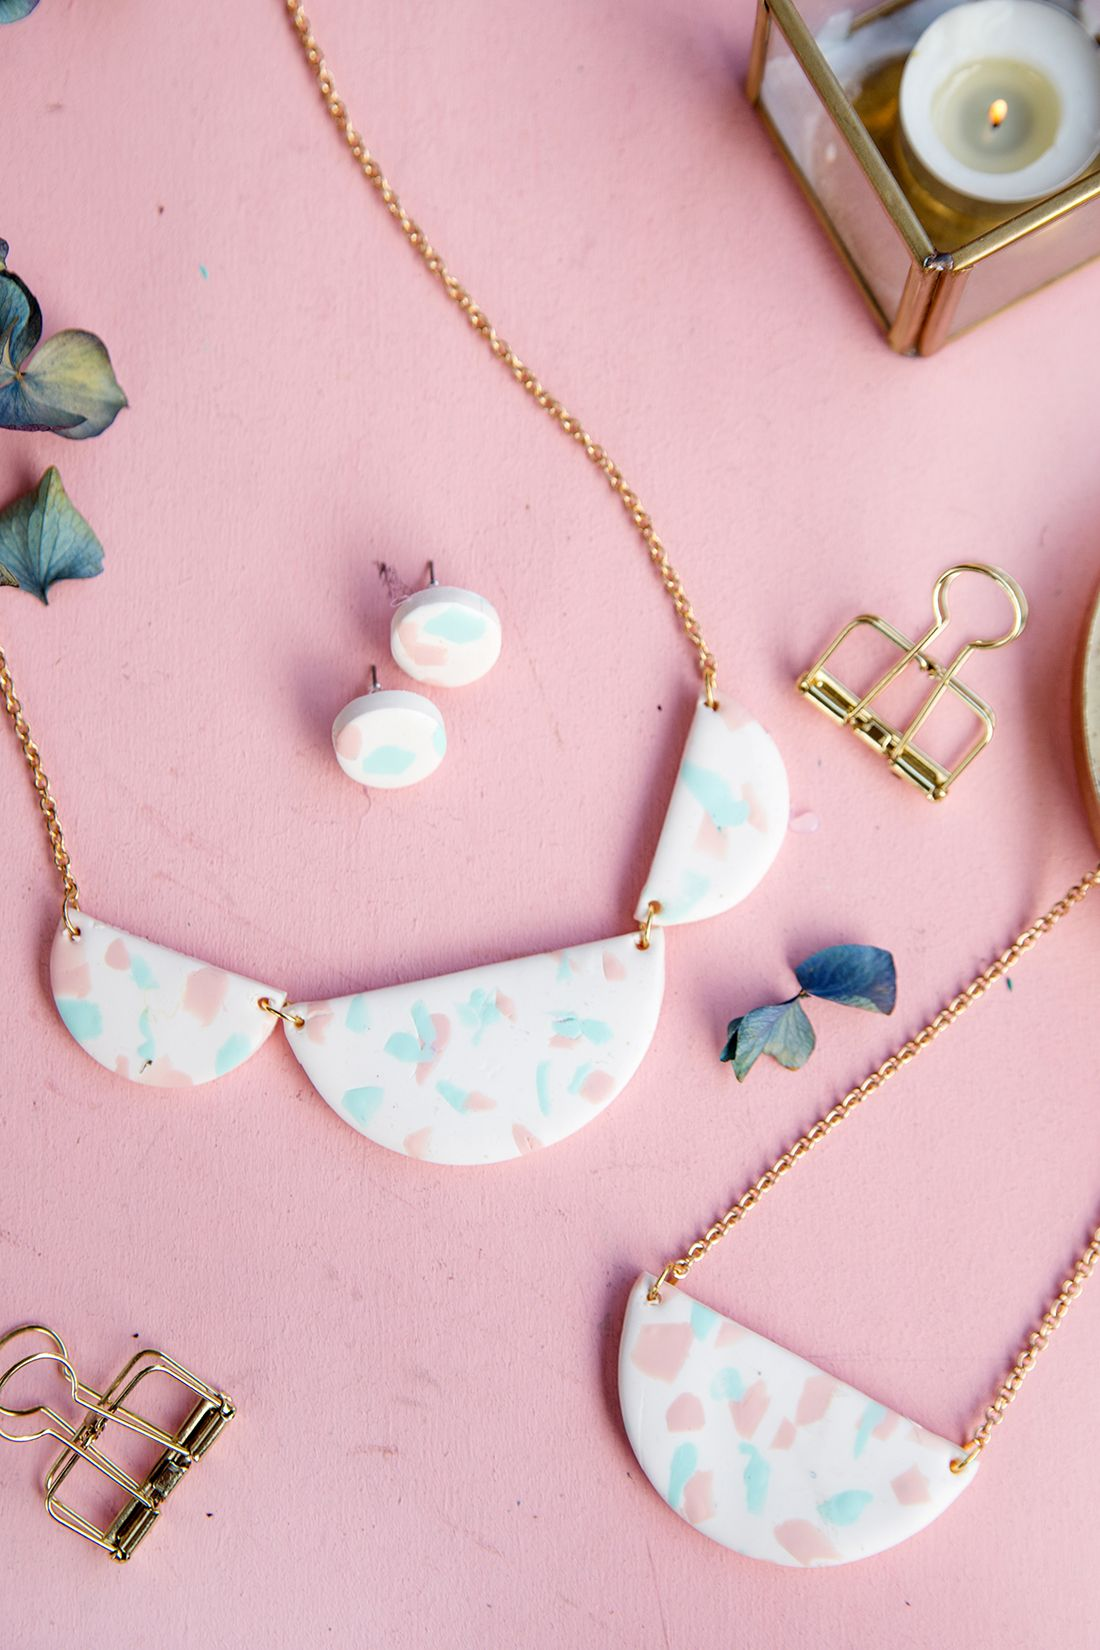 diy terrazzo-kette aus fimo selbermachen | polymer clay jewelry